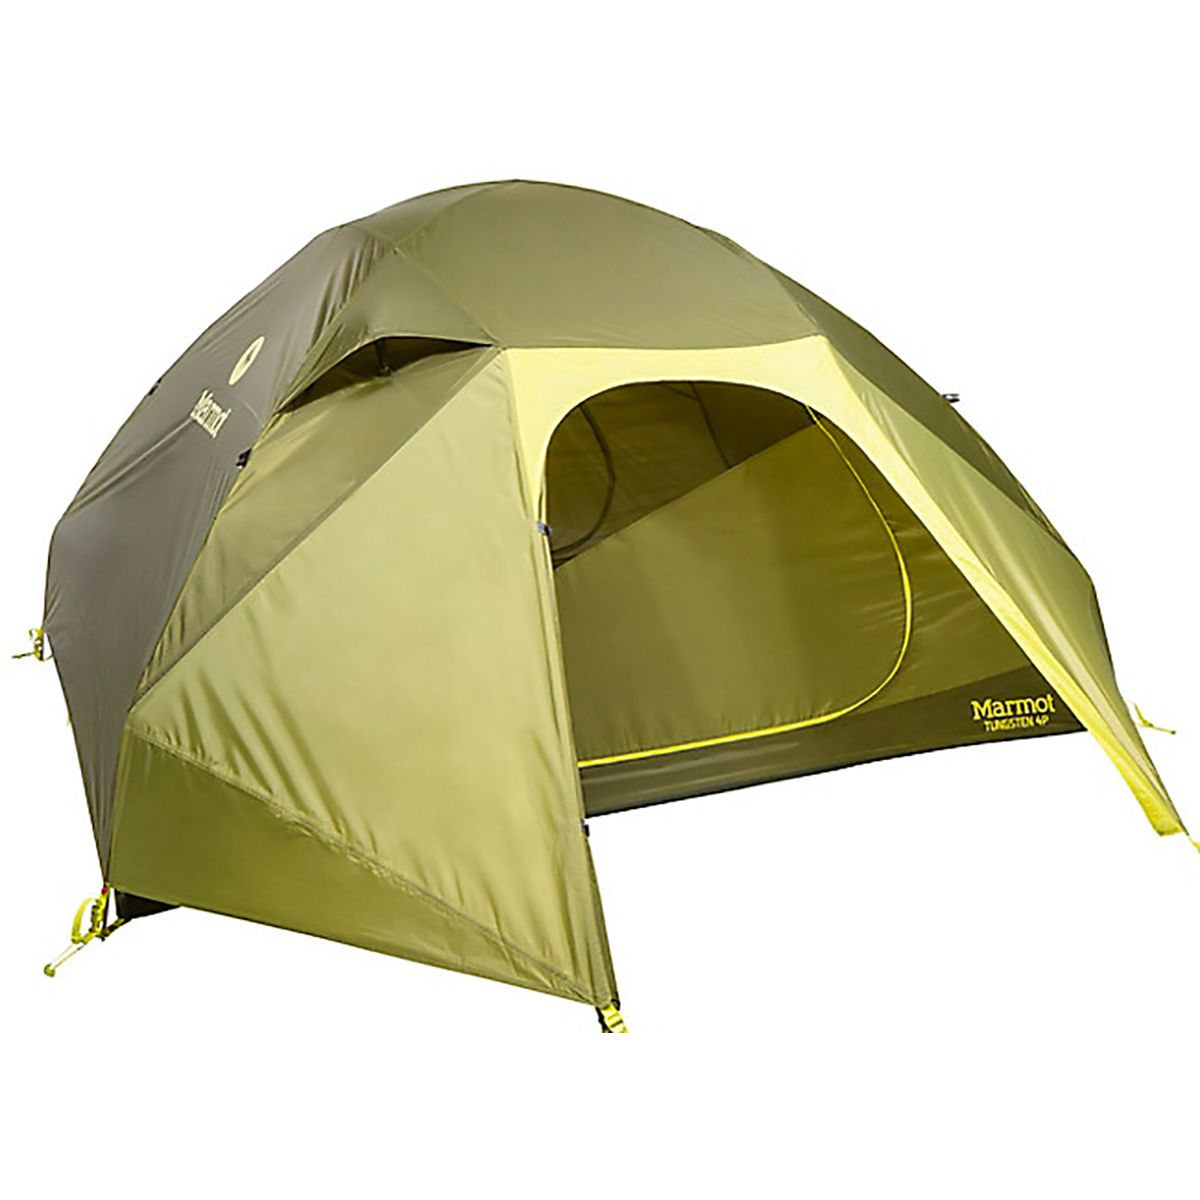 Marmot Tungsten Tent: 4-Person 3-Season Green Shadow/Moss, One Size